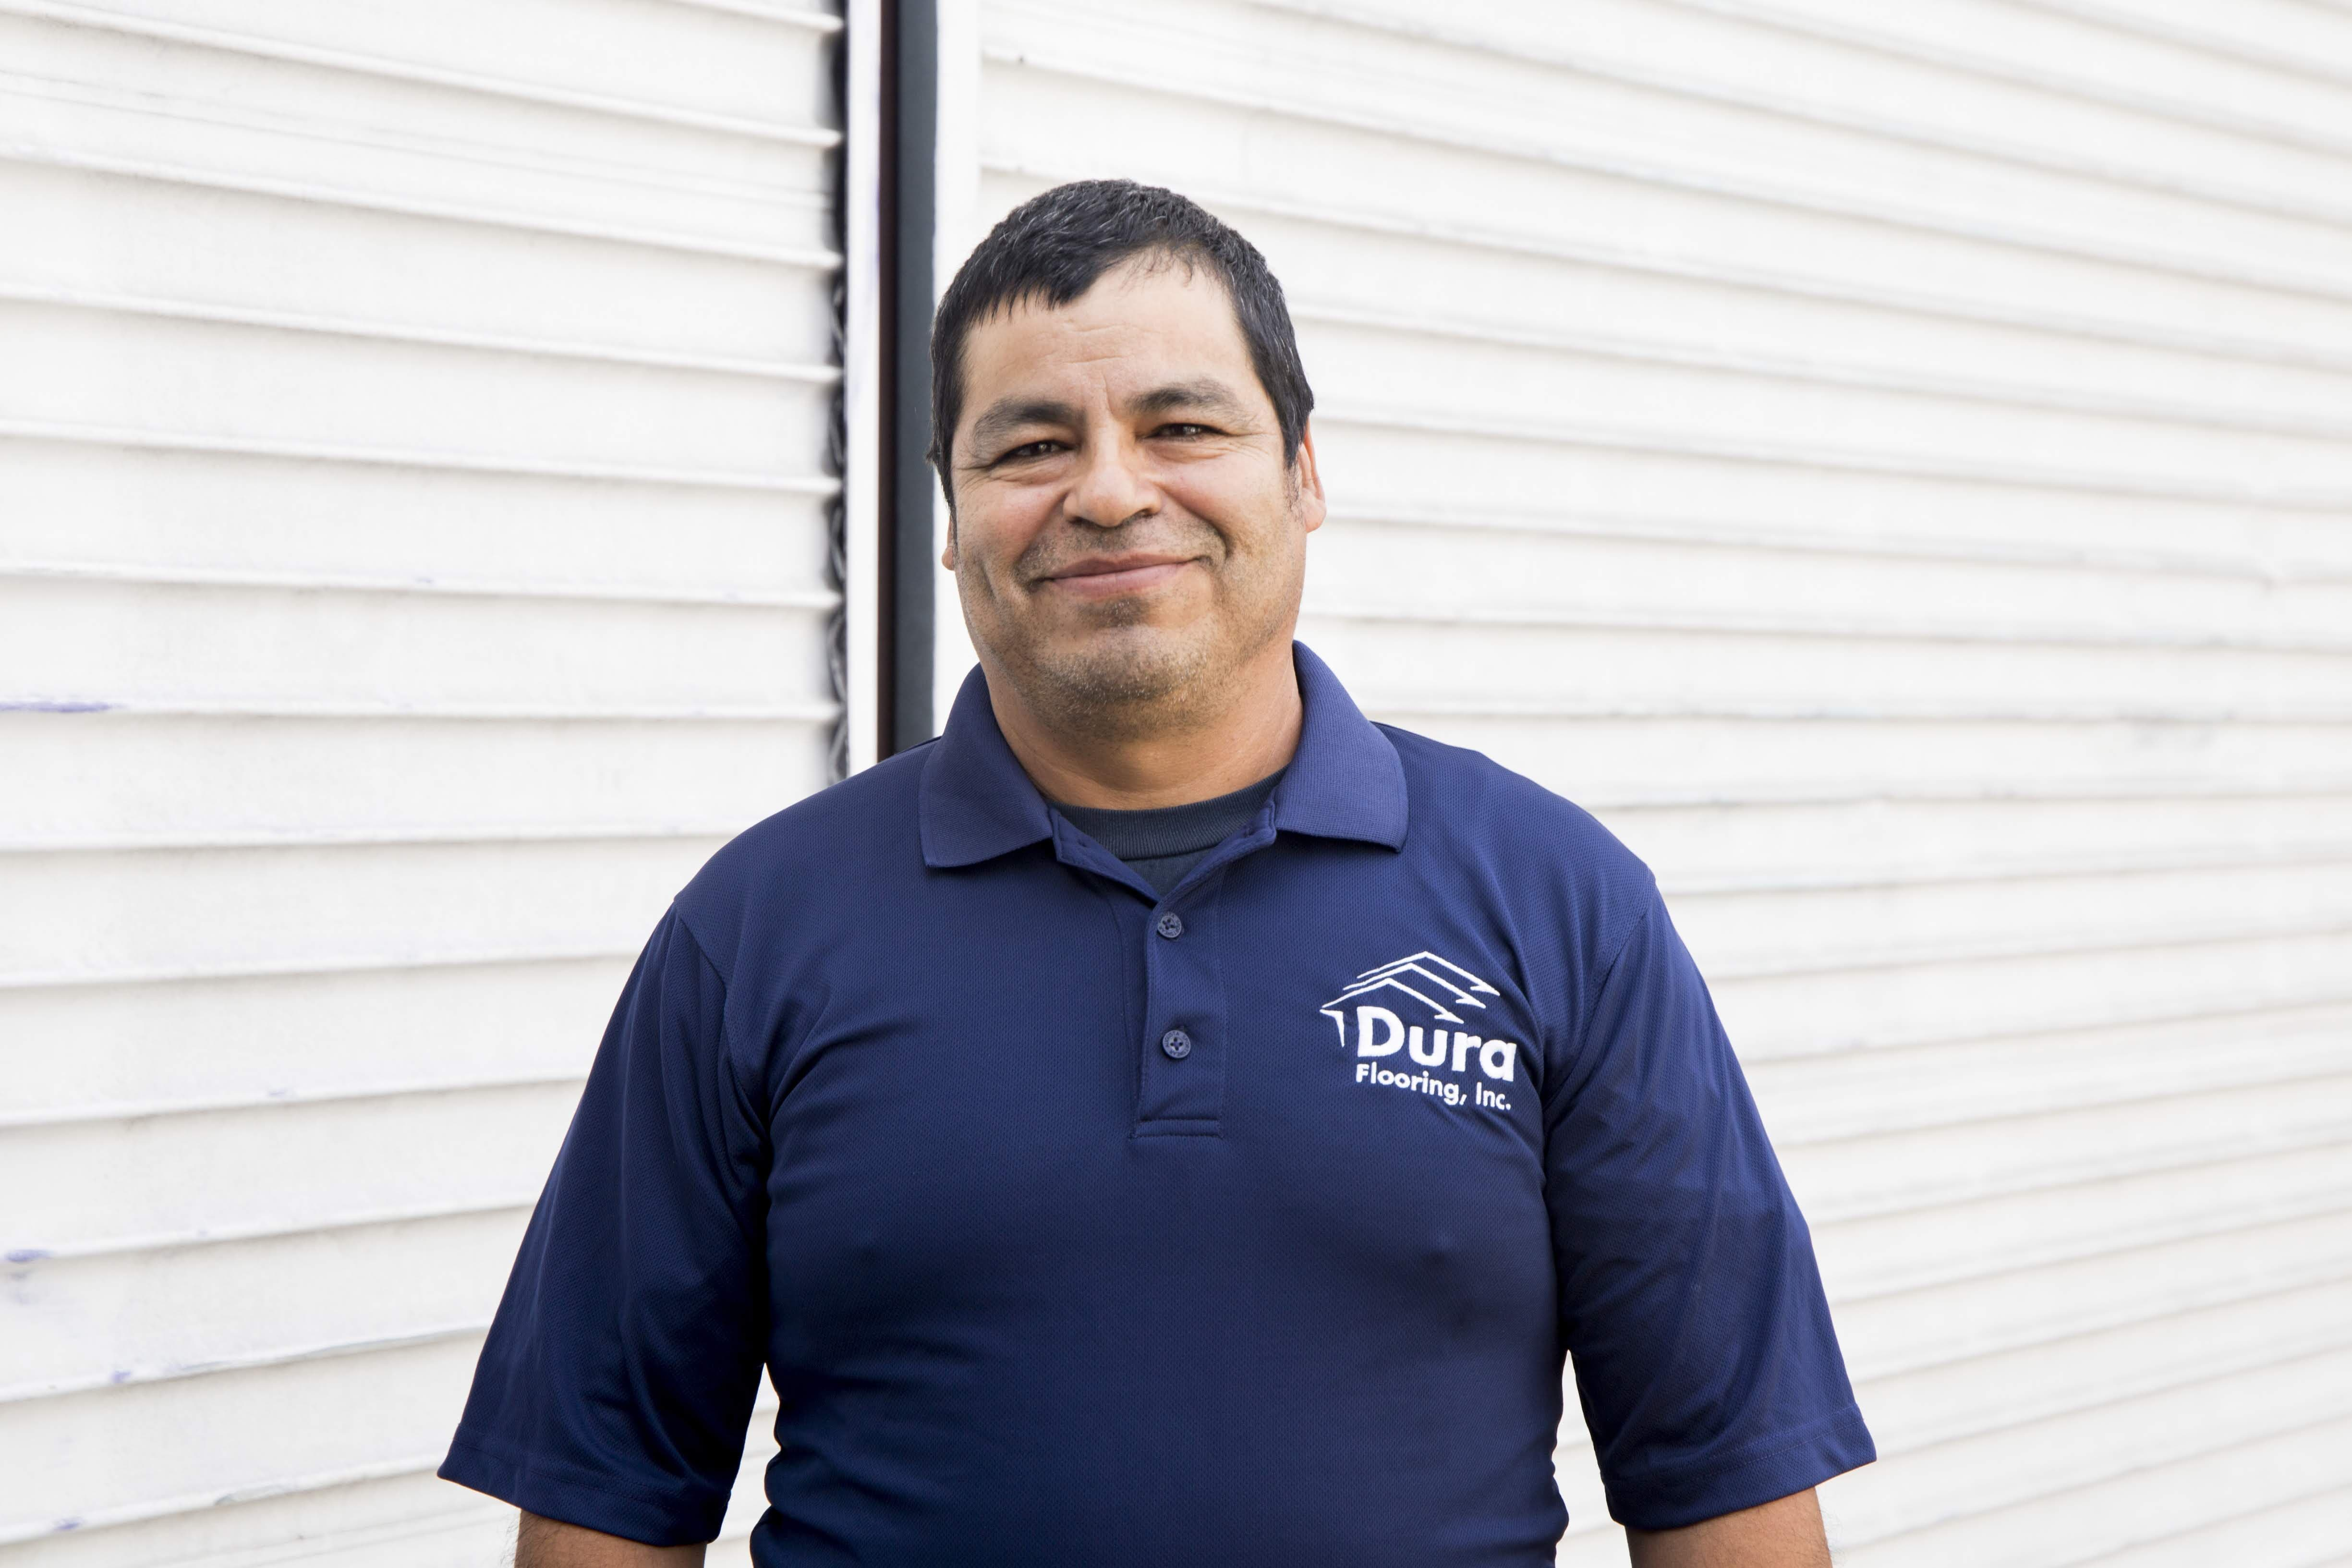 Manuel G, Warehouse at Dura Flooring, Inc